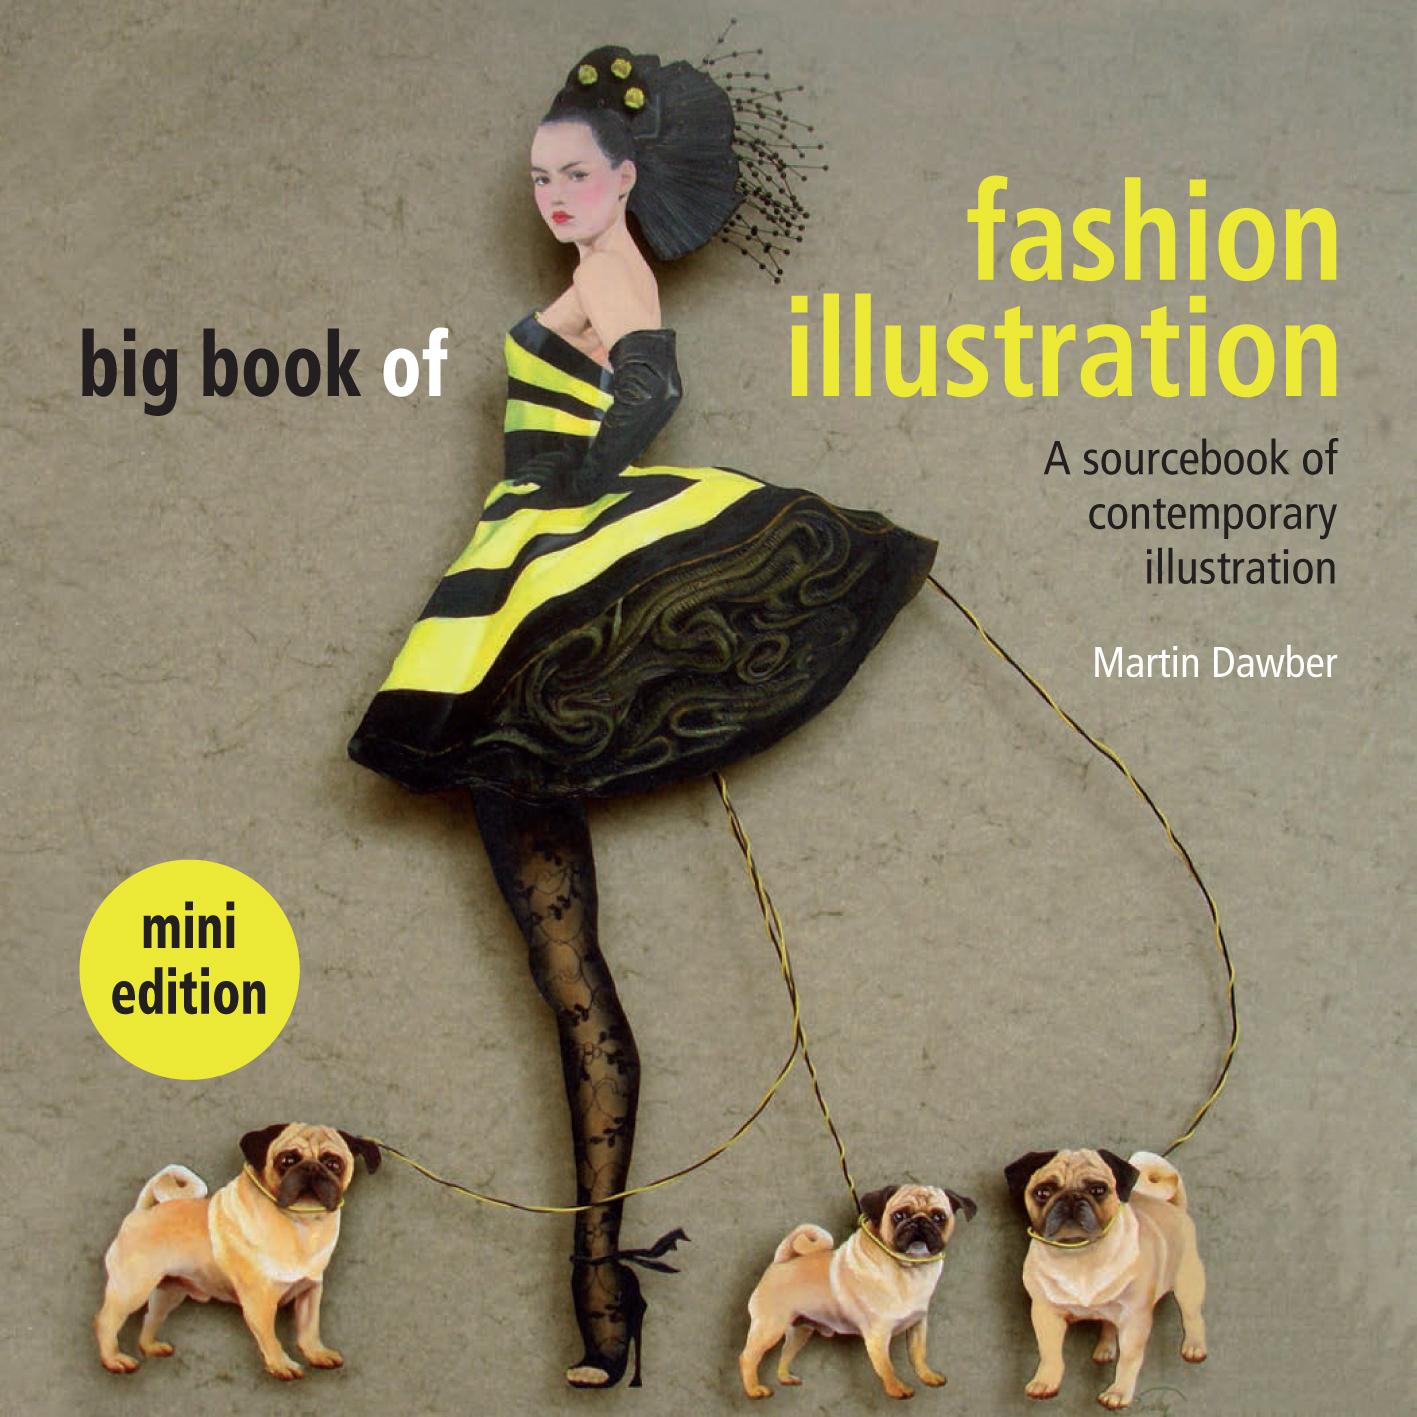 Big Book of Fashion Illustration mini edition